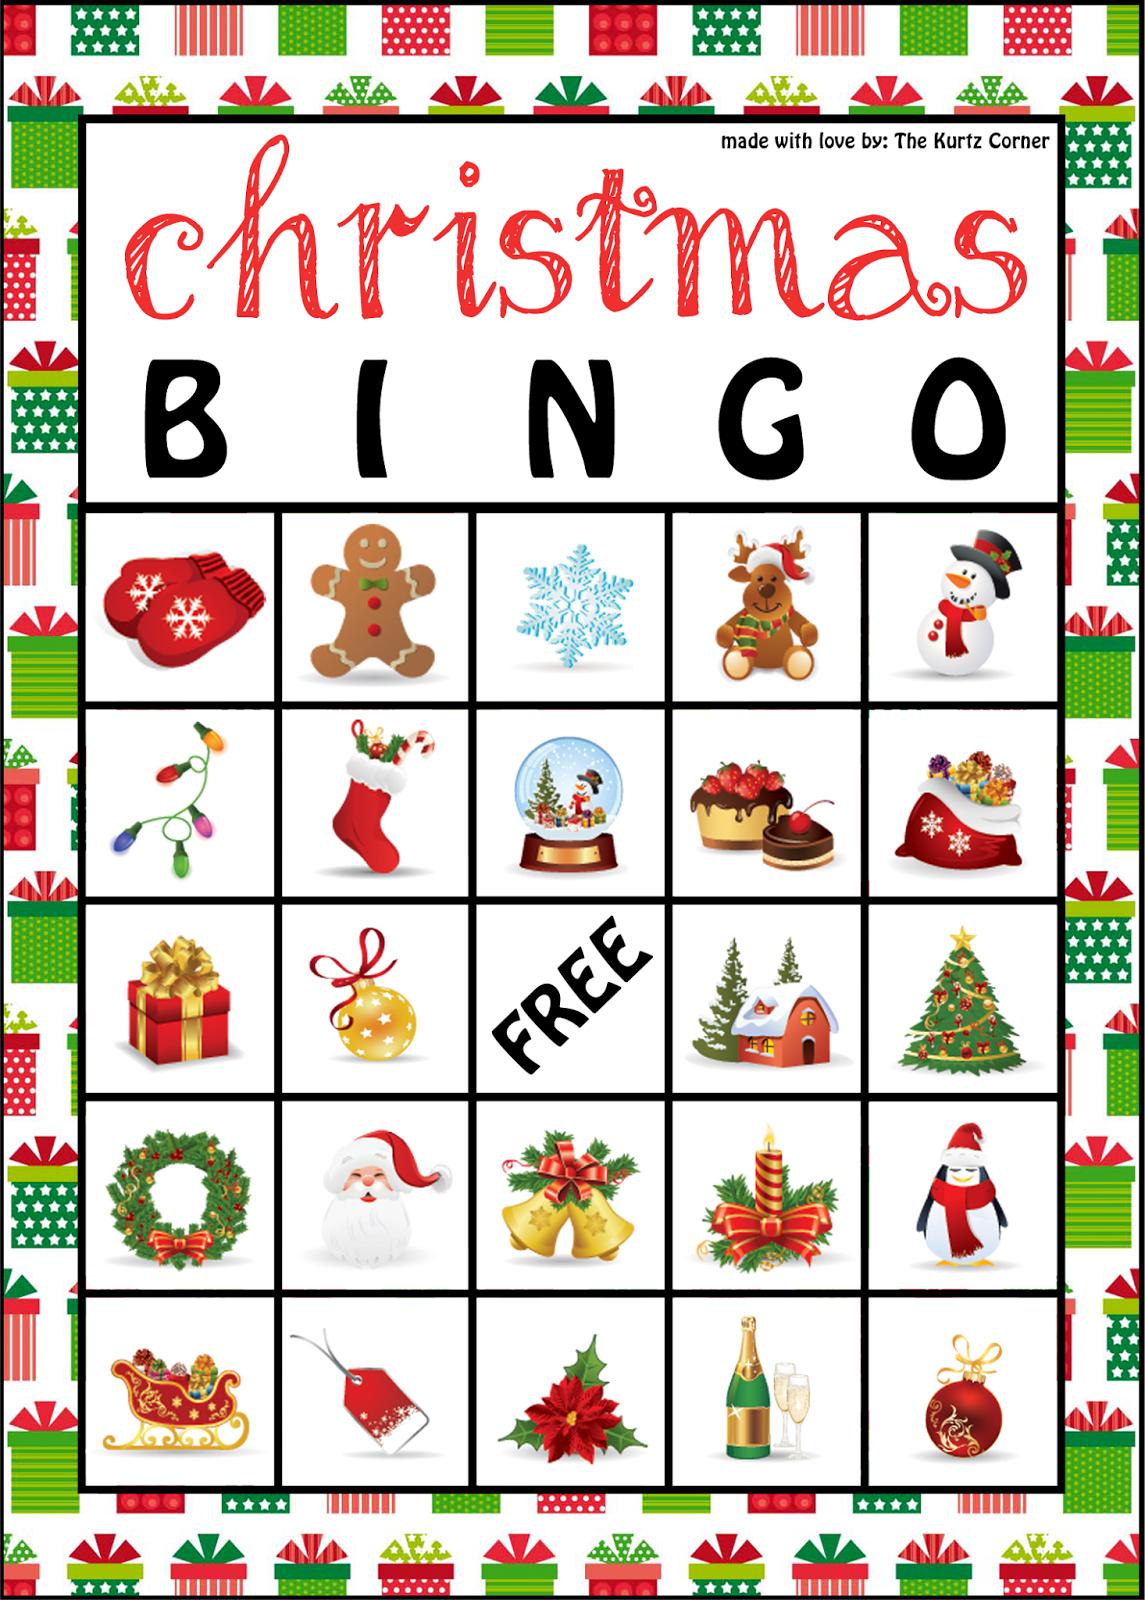 The Kurtz Corner: Free Printable Christmas Bingo Cards | Winter / X - Free Printable Bingo Cards 1 100